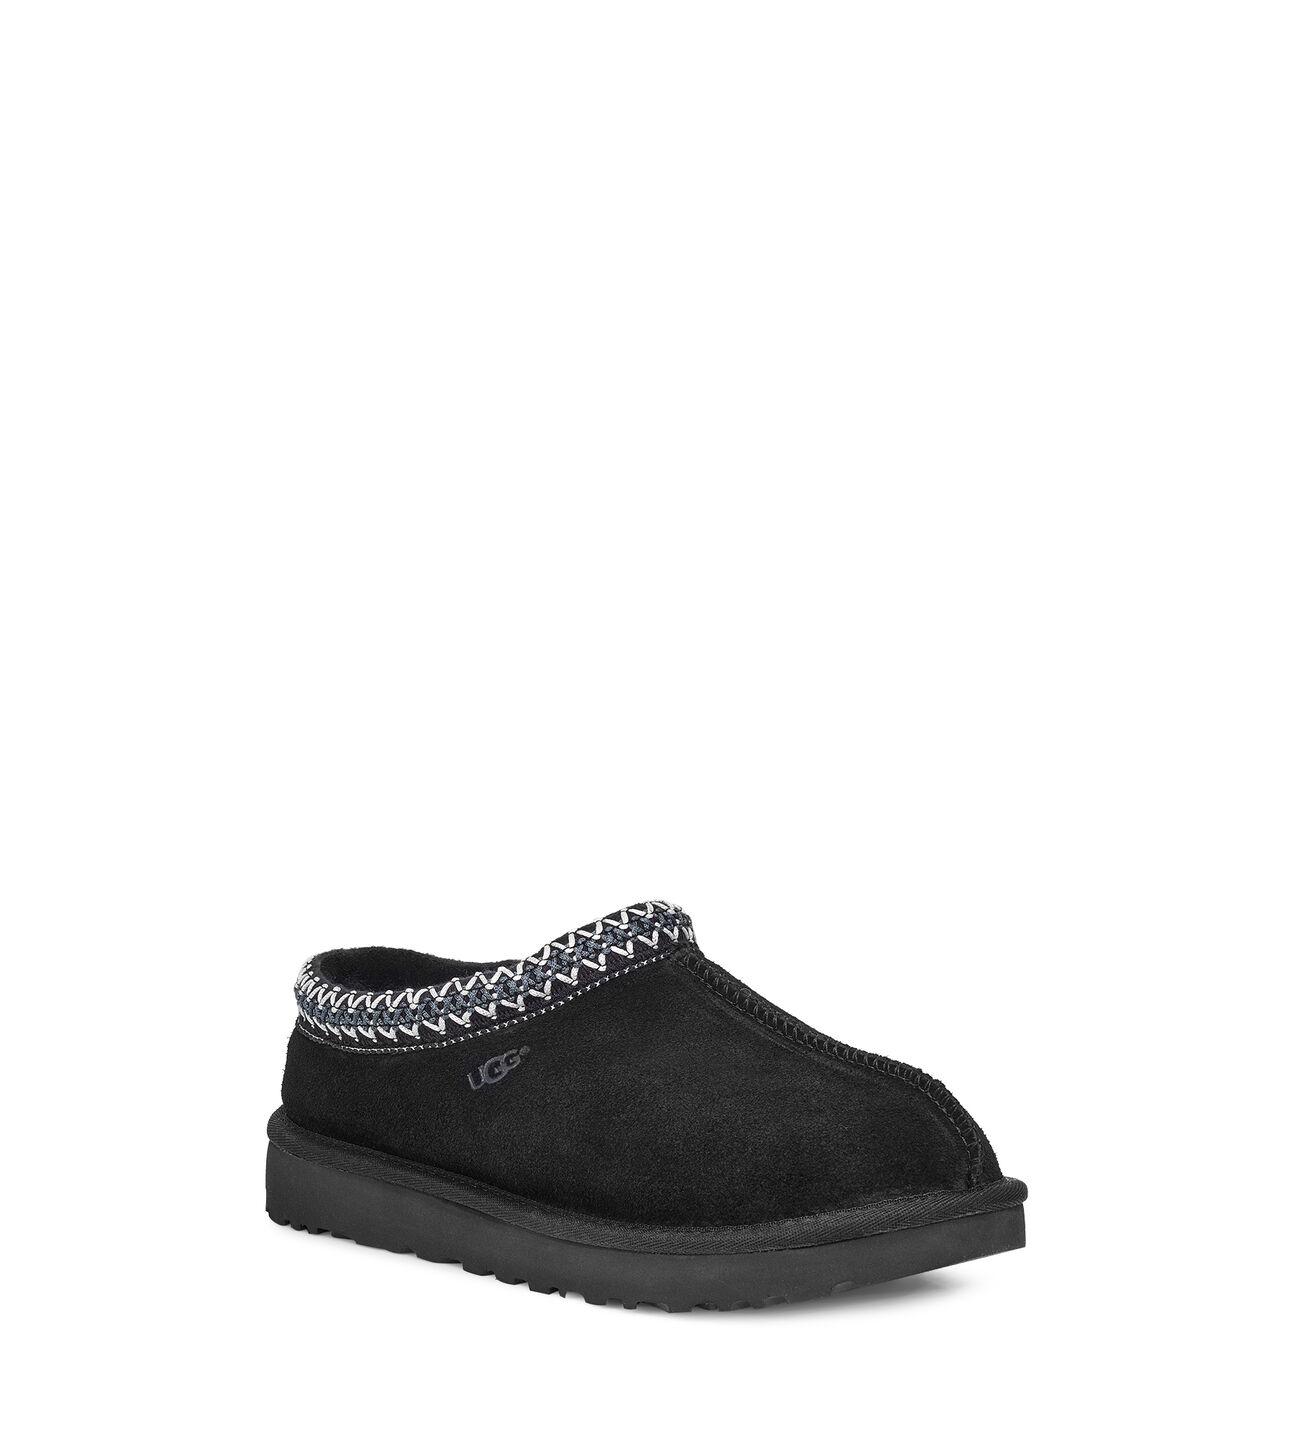 aff4ba42fc4 Tasman Classic Suede Slippers